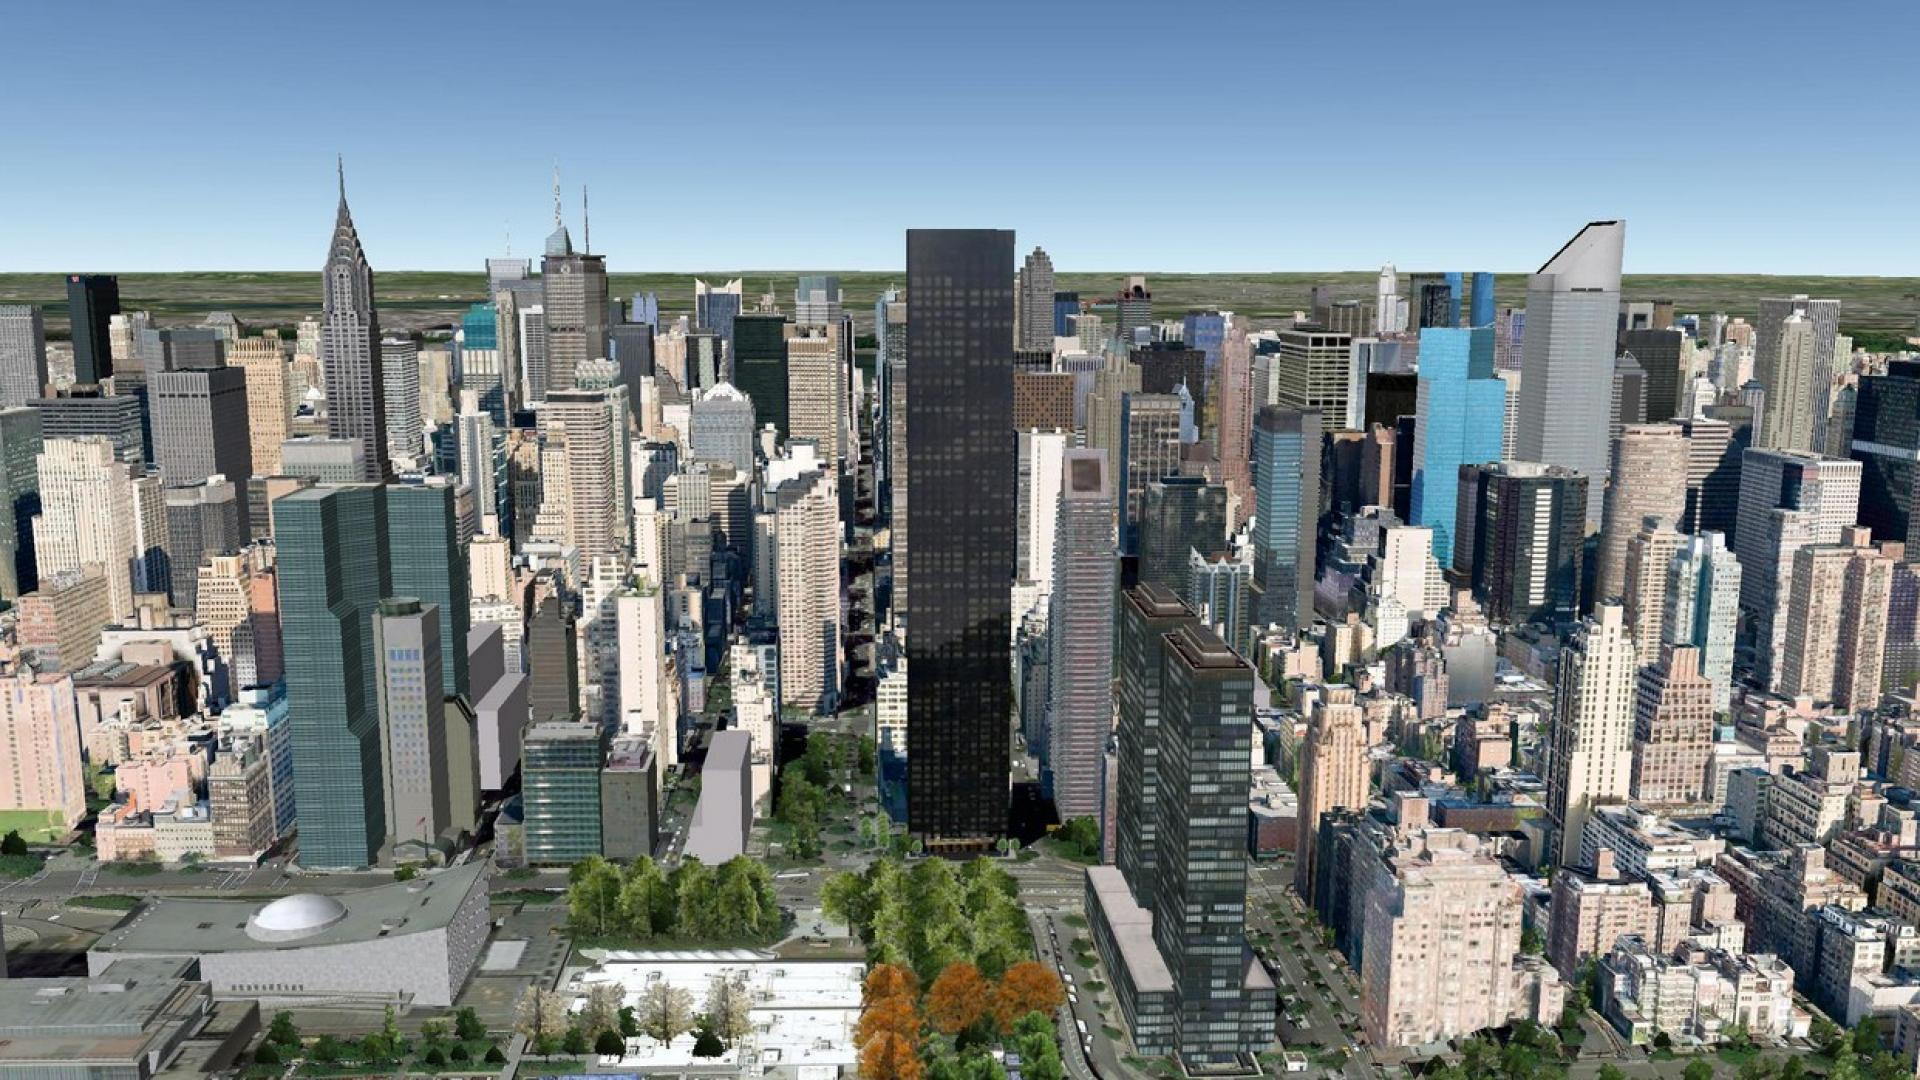 Trump World Tower 845 United Nations Plaza Nyc Condo